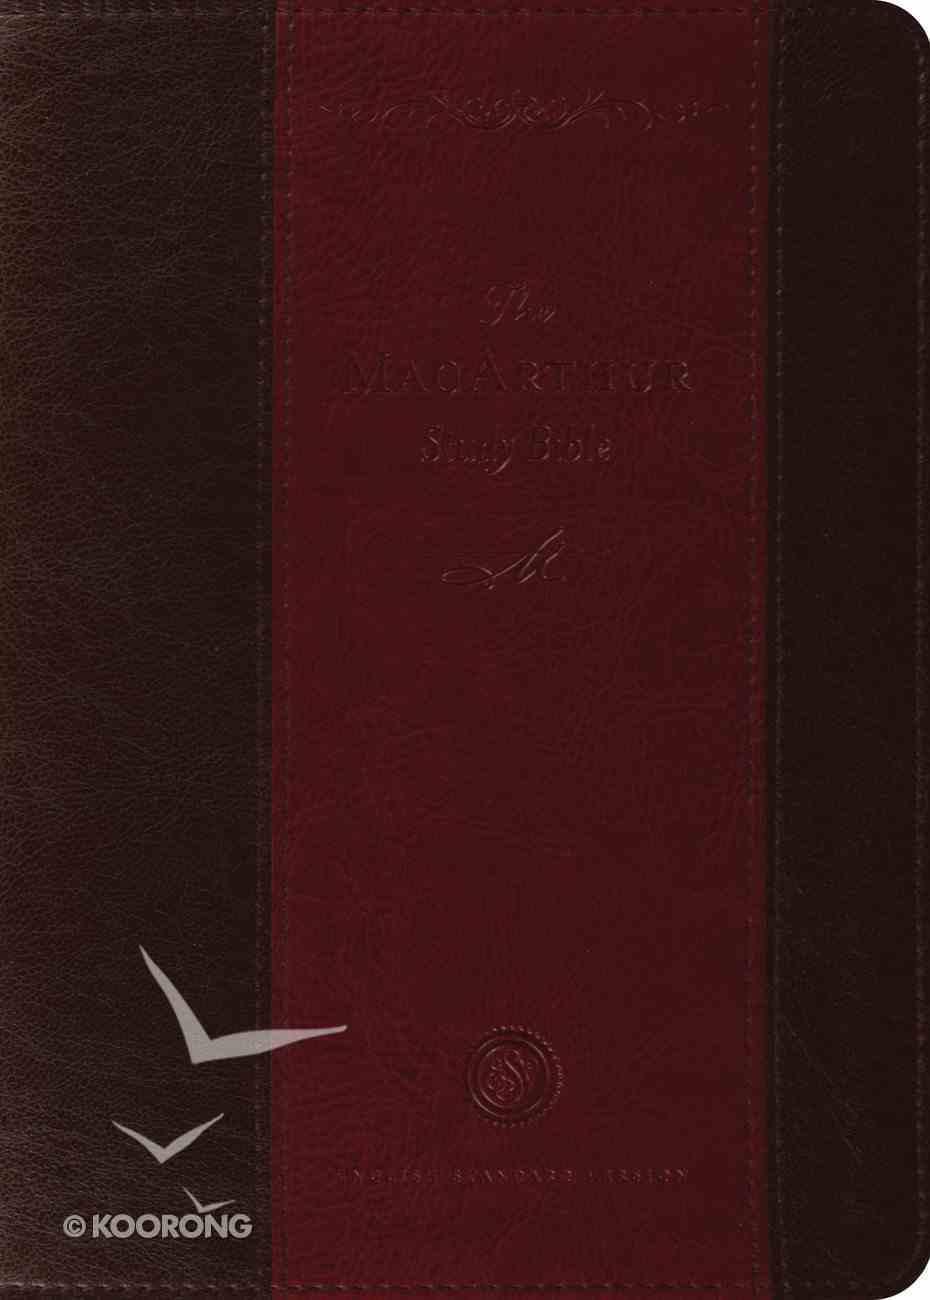 ESV Macarthur Study Brown/Crimson Imitation Leather